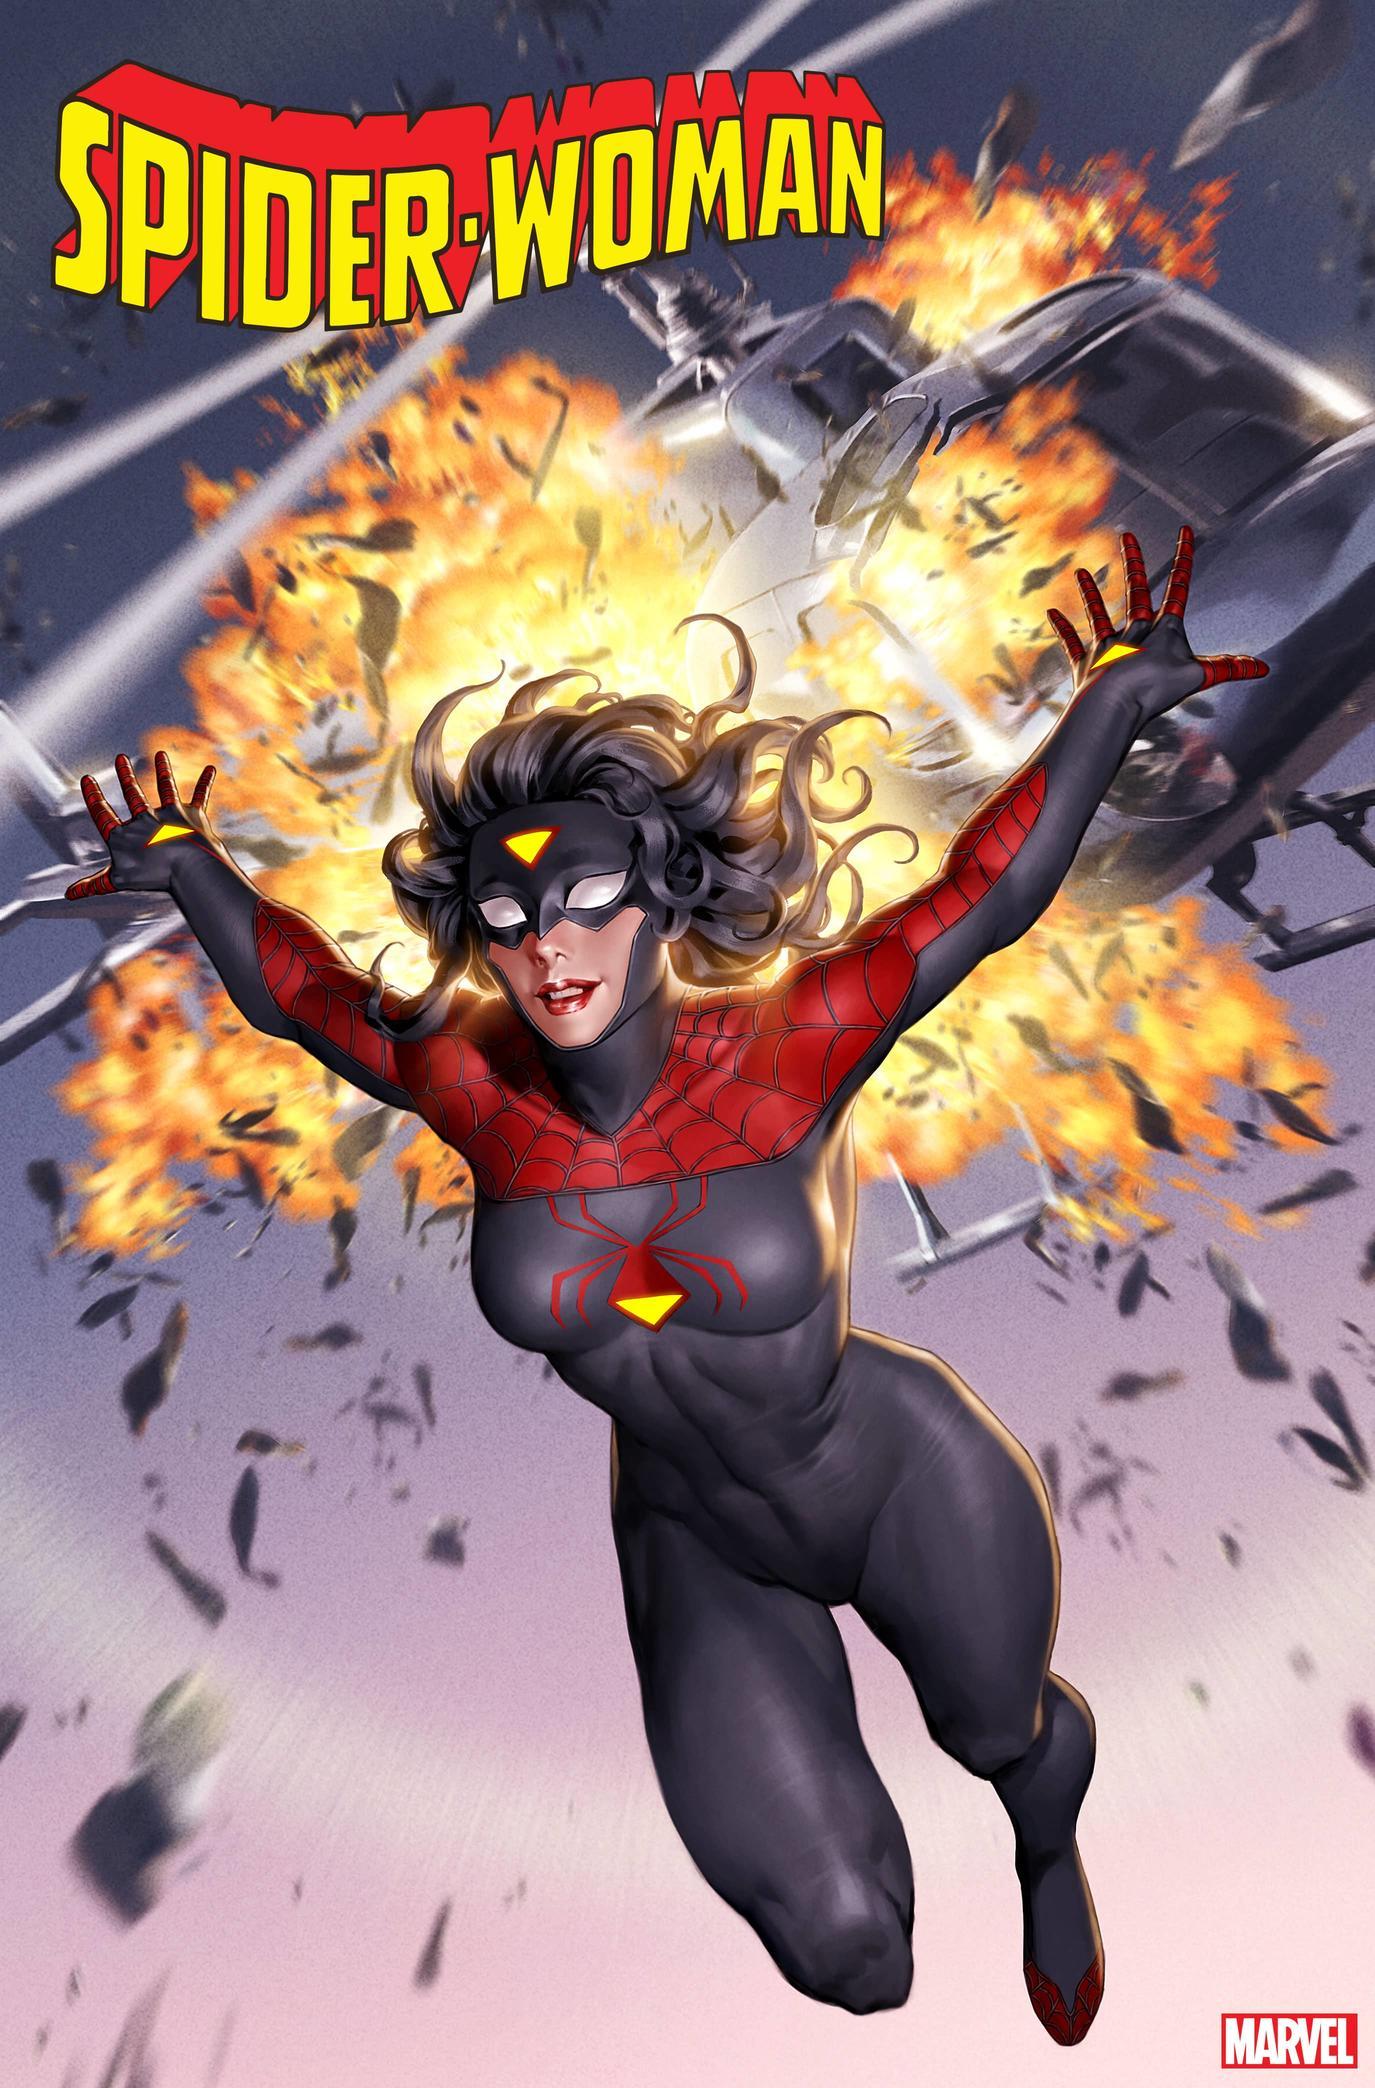 Spider-Woman, Vol. 1: Bad Blood by Karla Pacheco, Pere Pérez